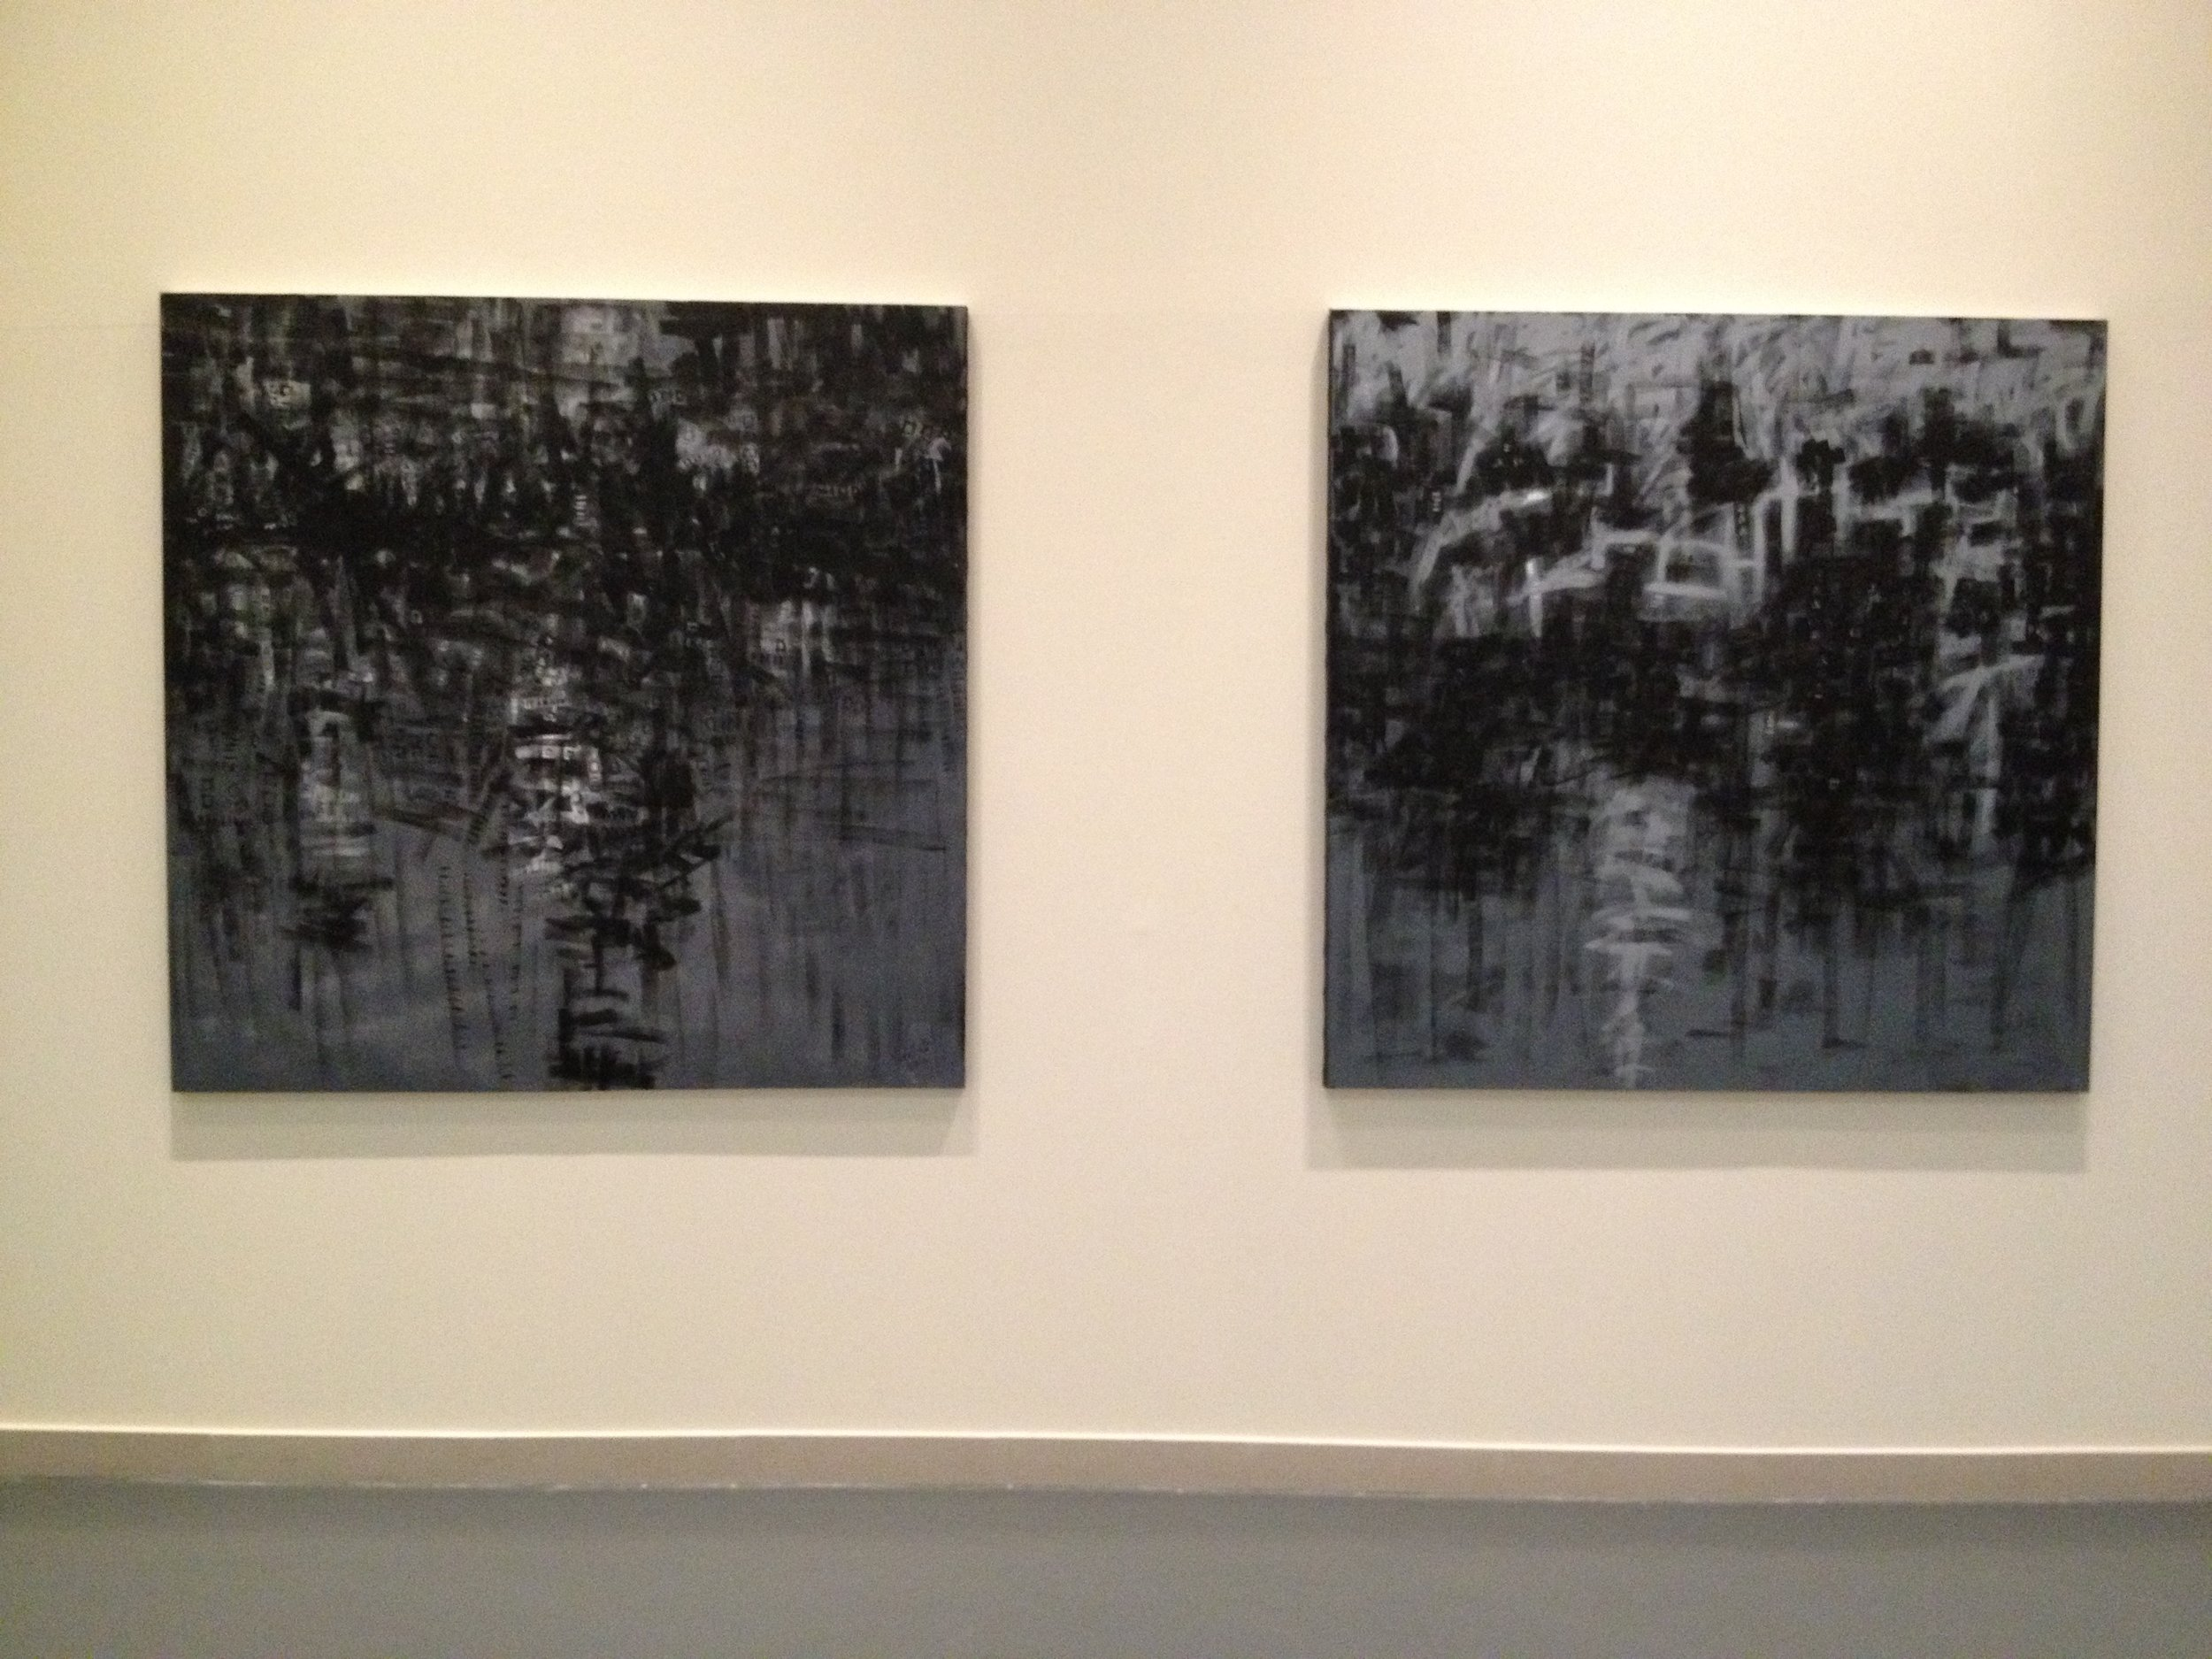 Abstract by Mohammad Al Qassab